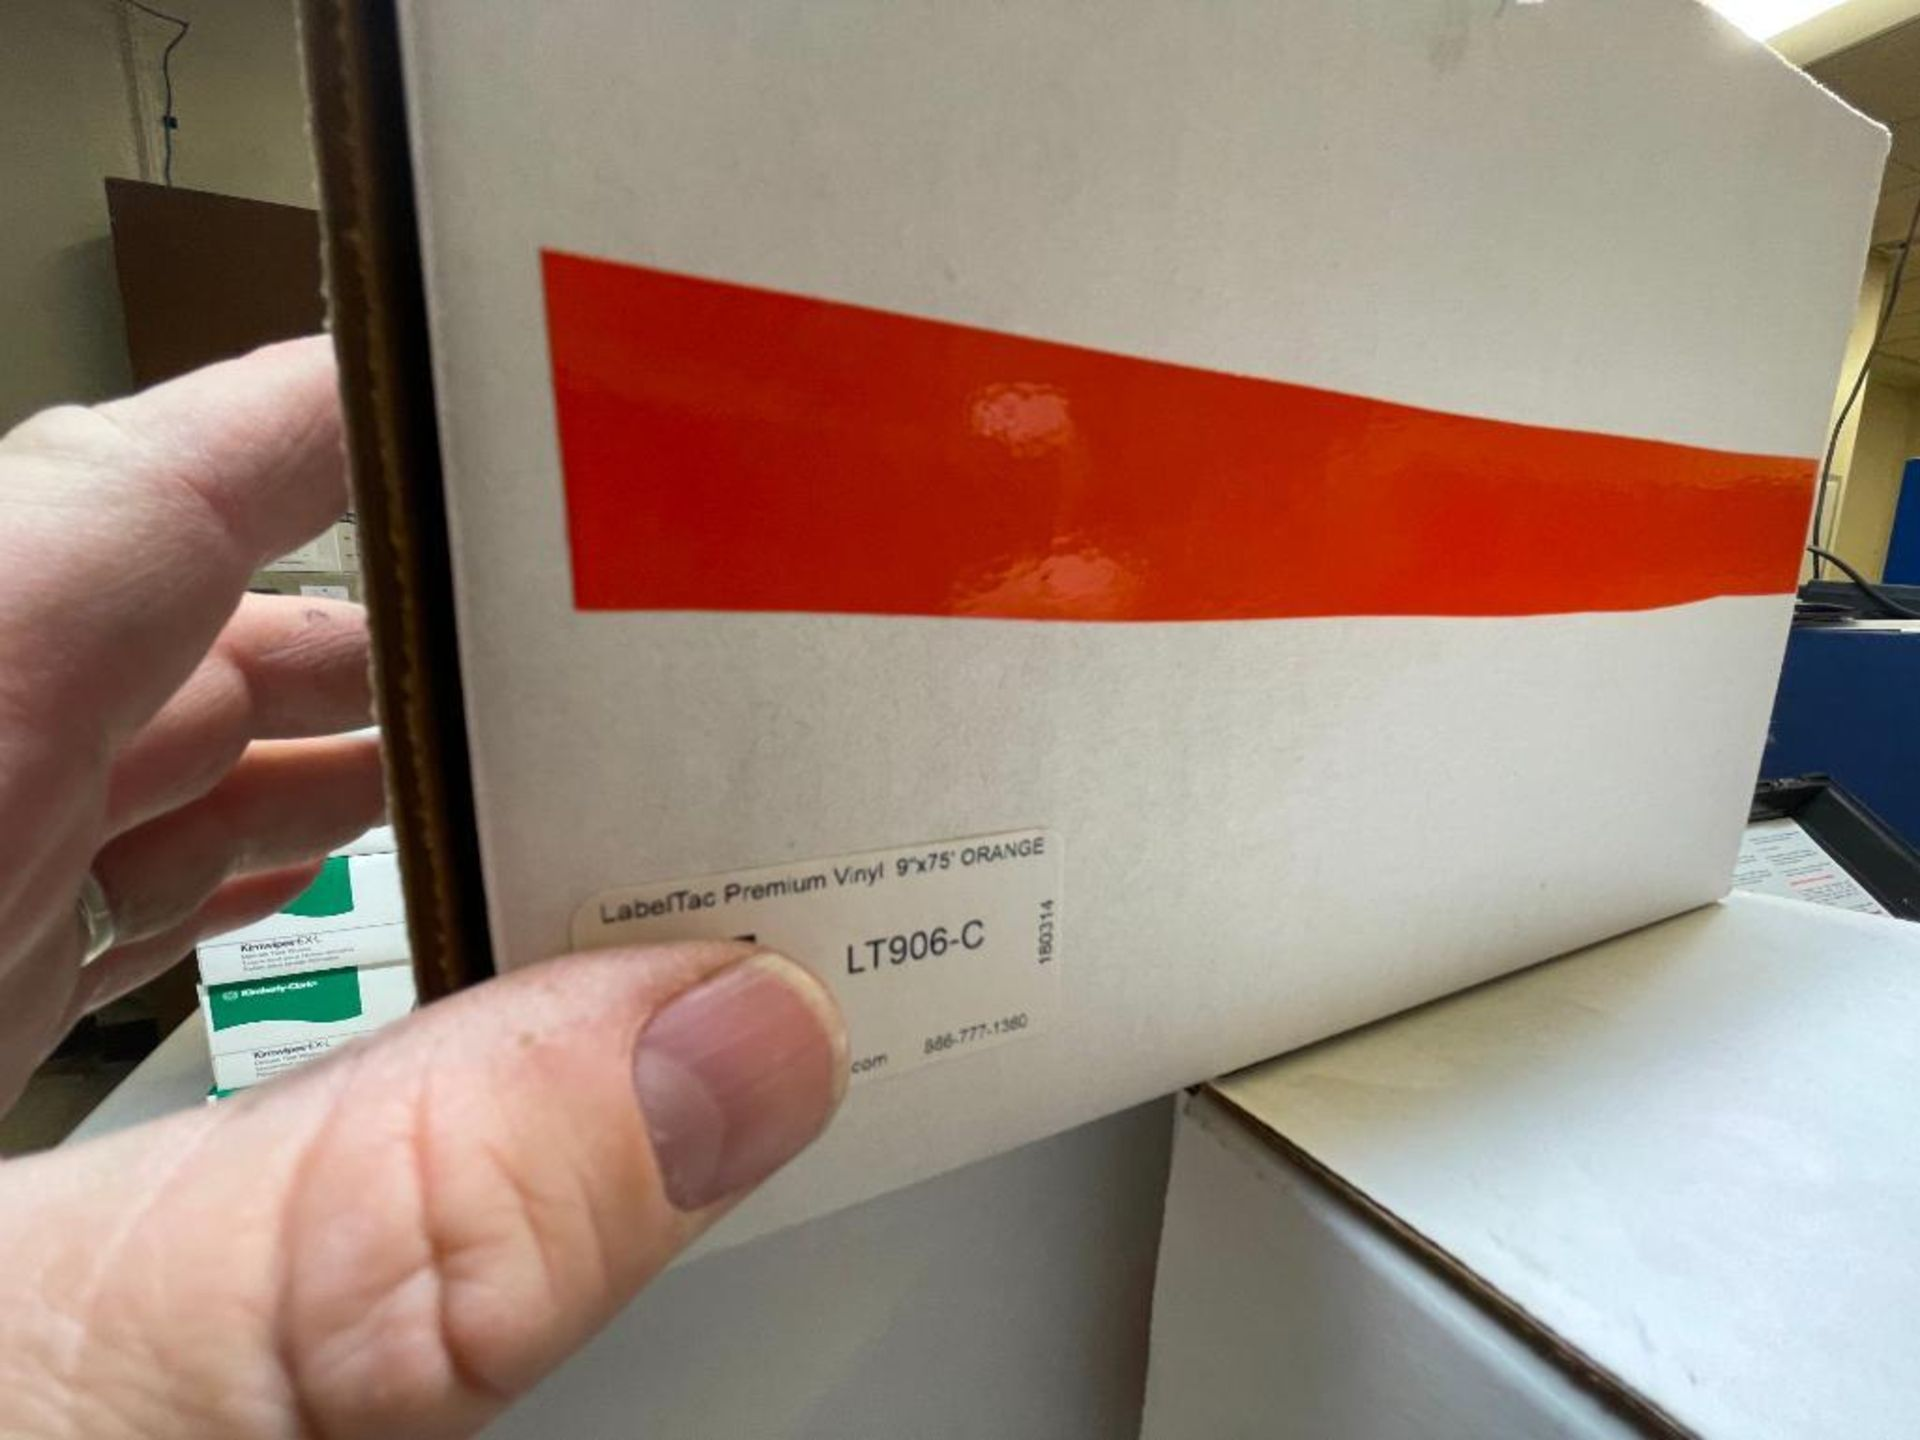 Labeltac barcode printer - Image 6 of 9